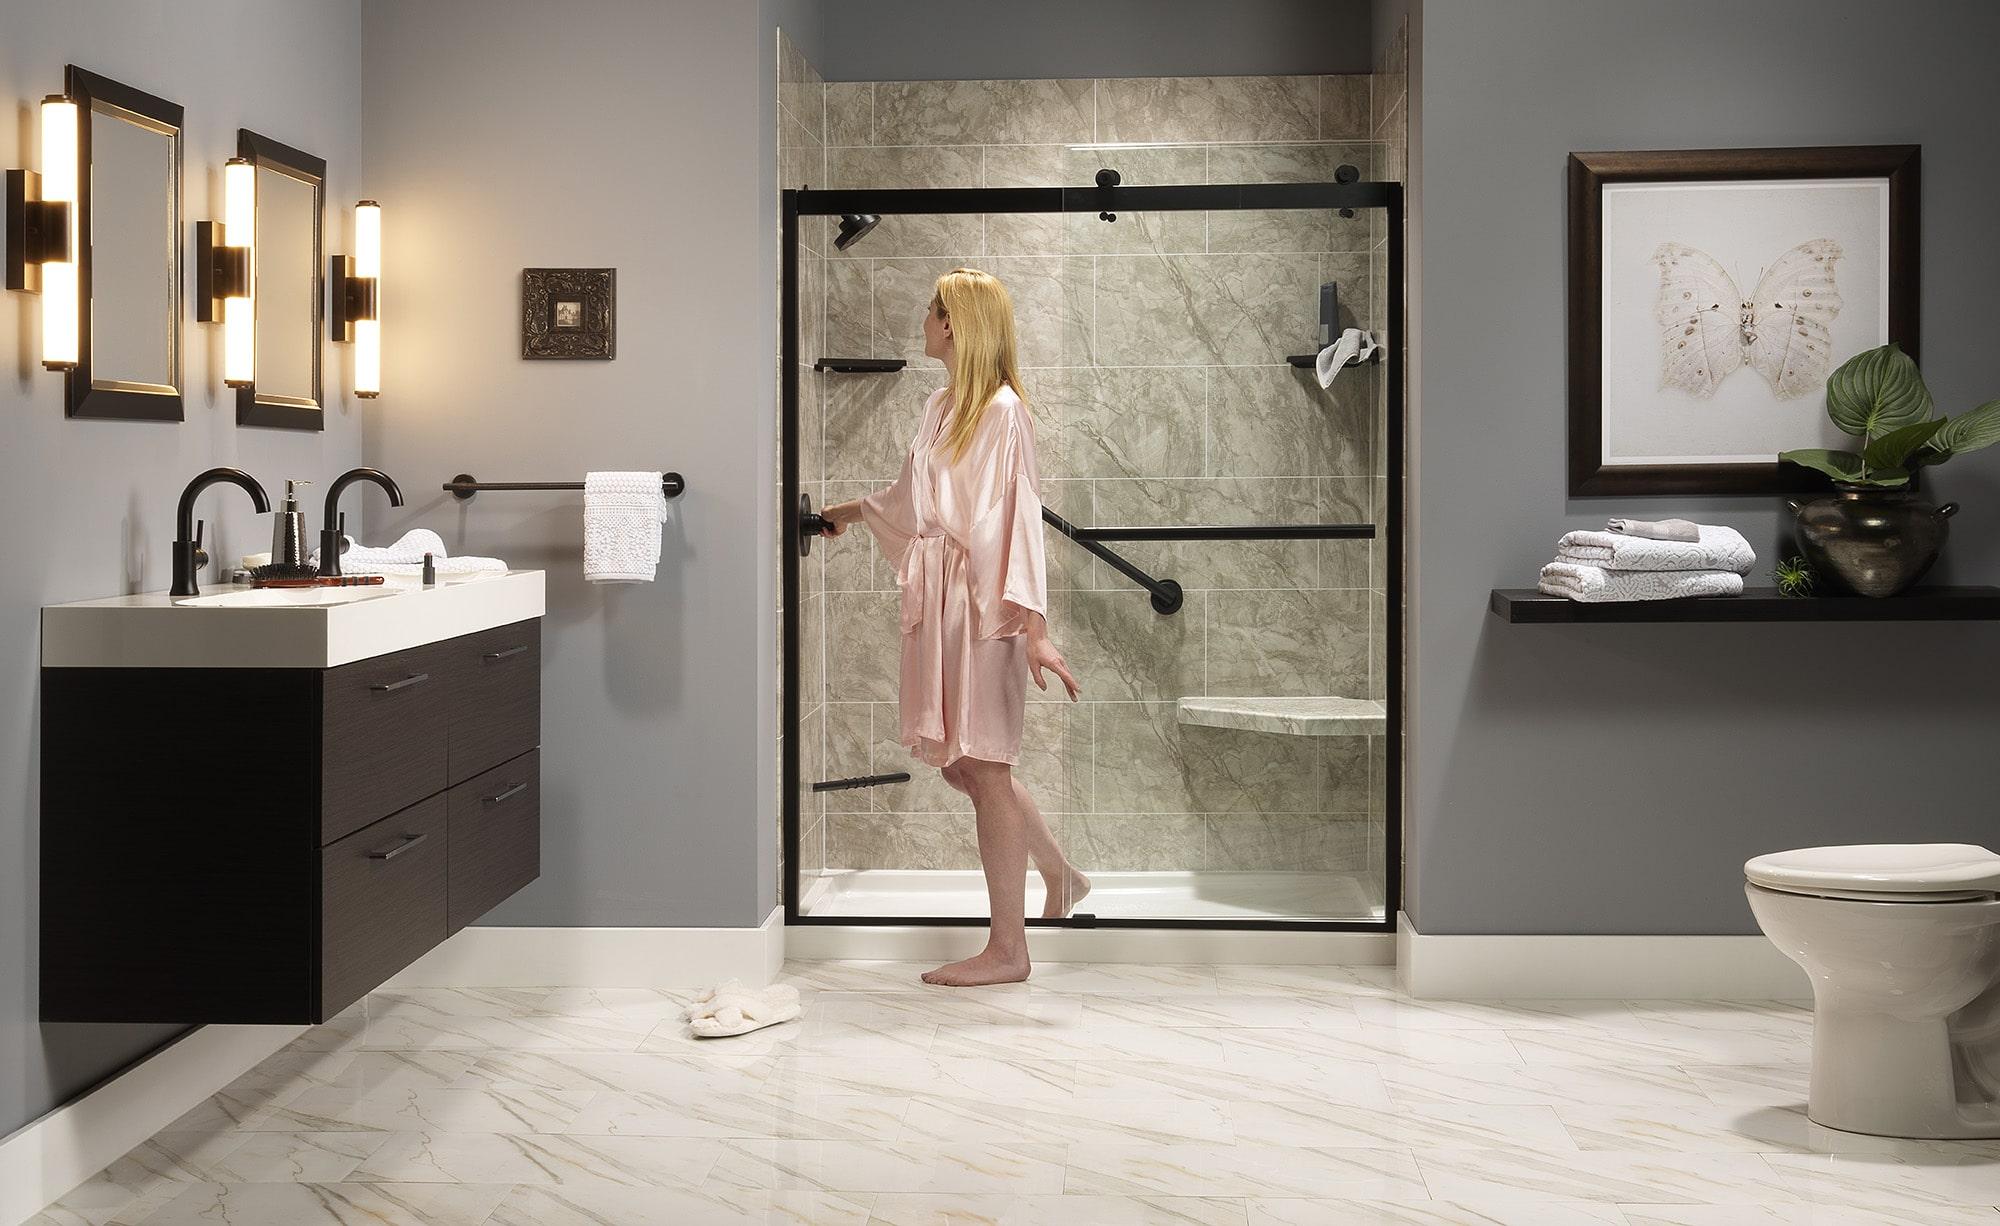 South Florida Tub to Shower Conversions - Bathrooms Plus Inc (11)